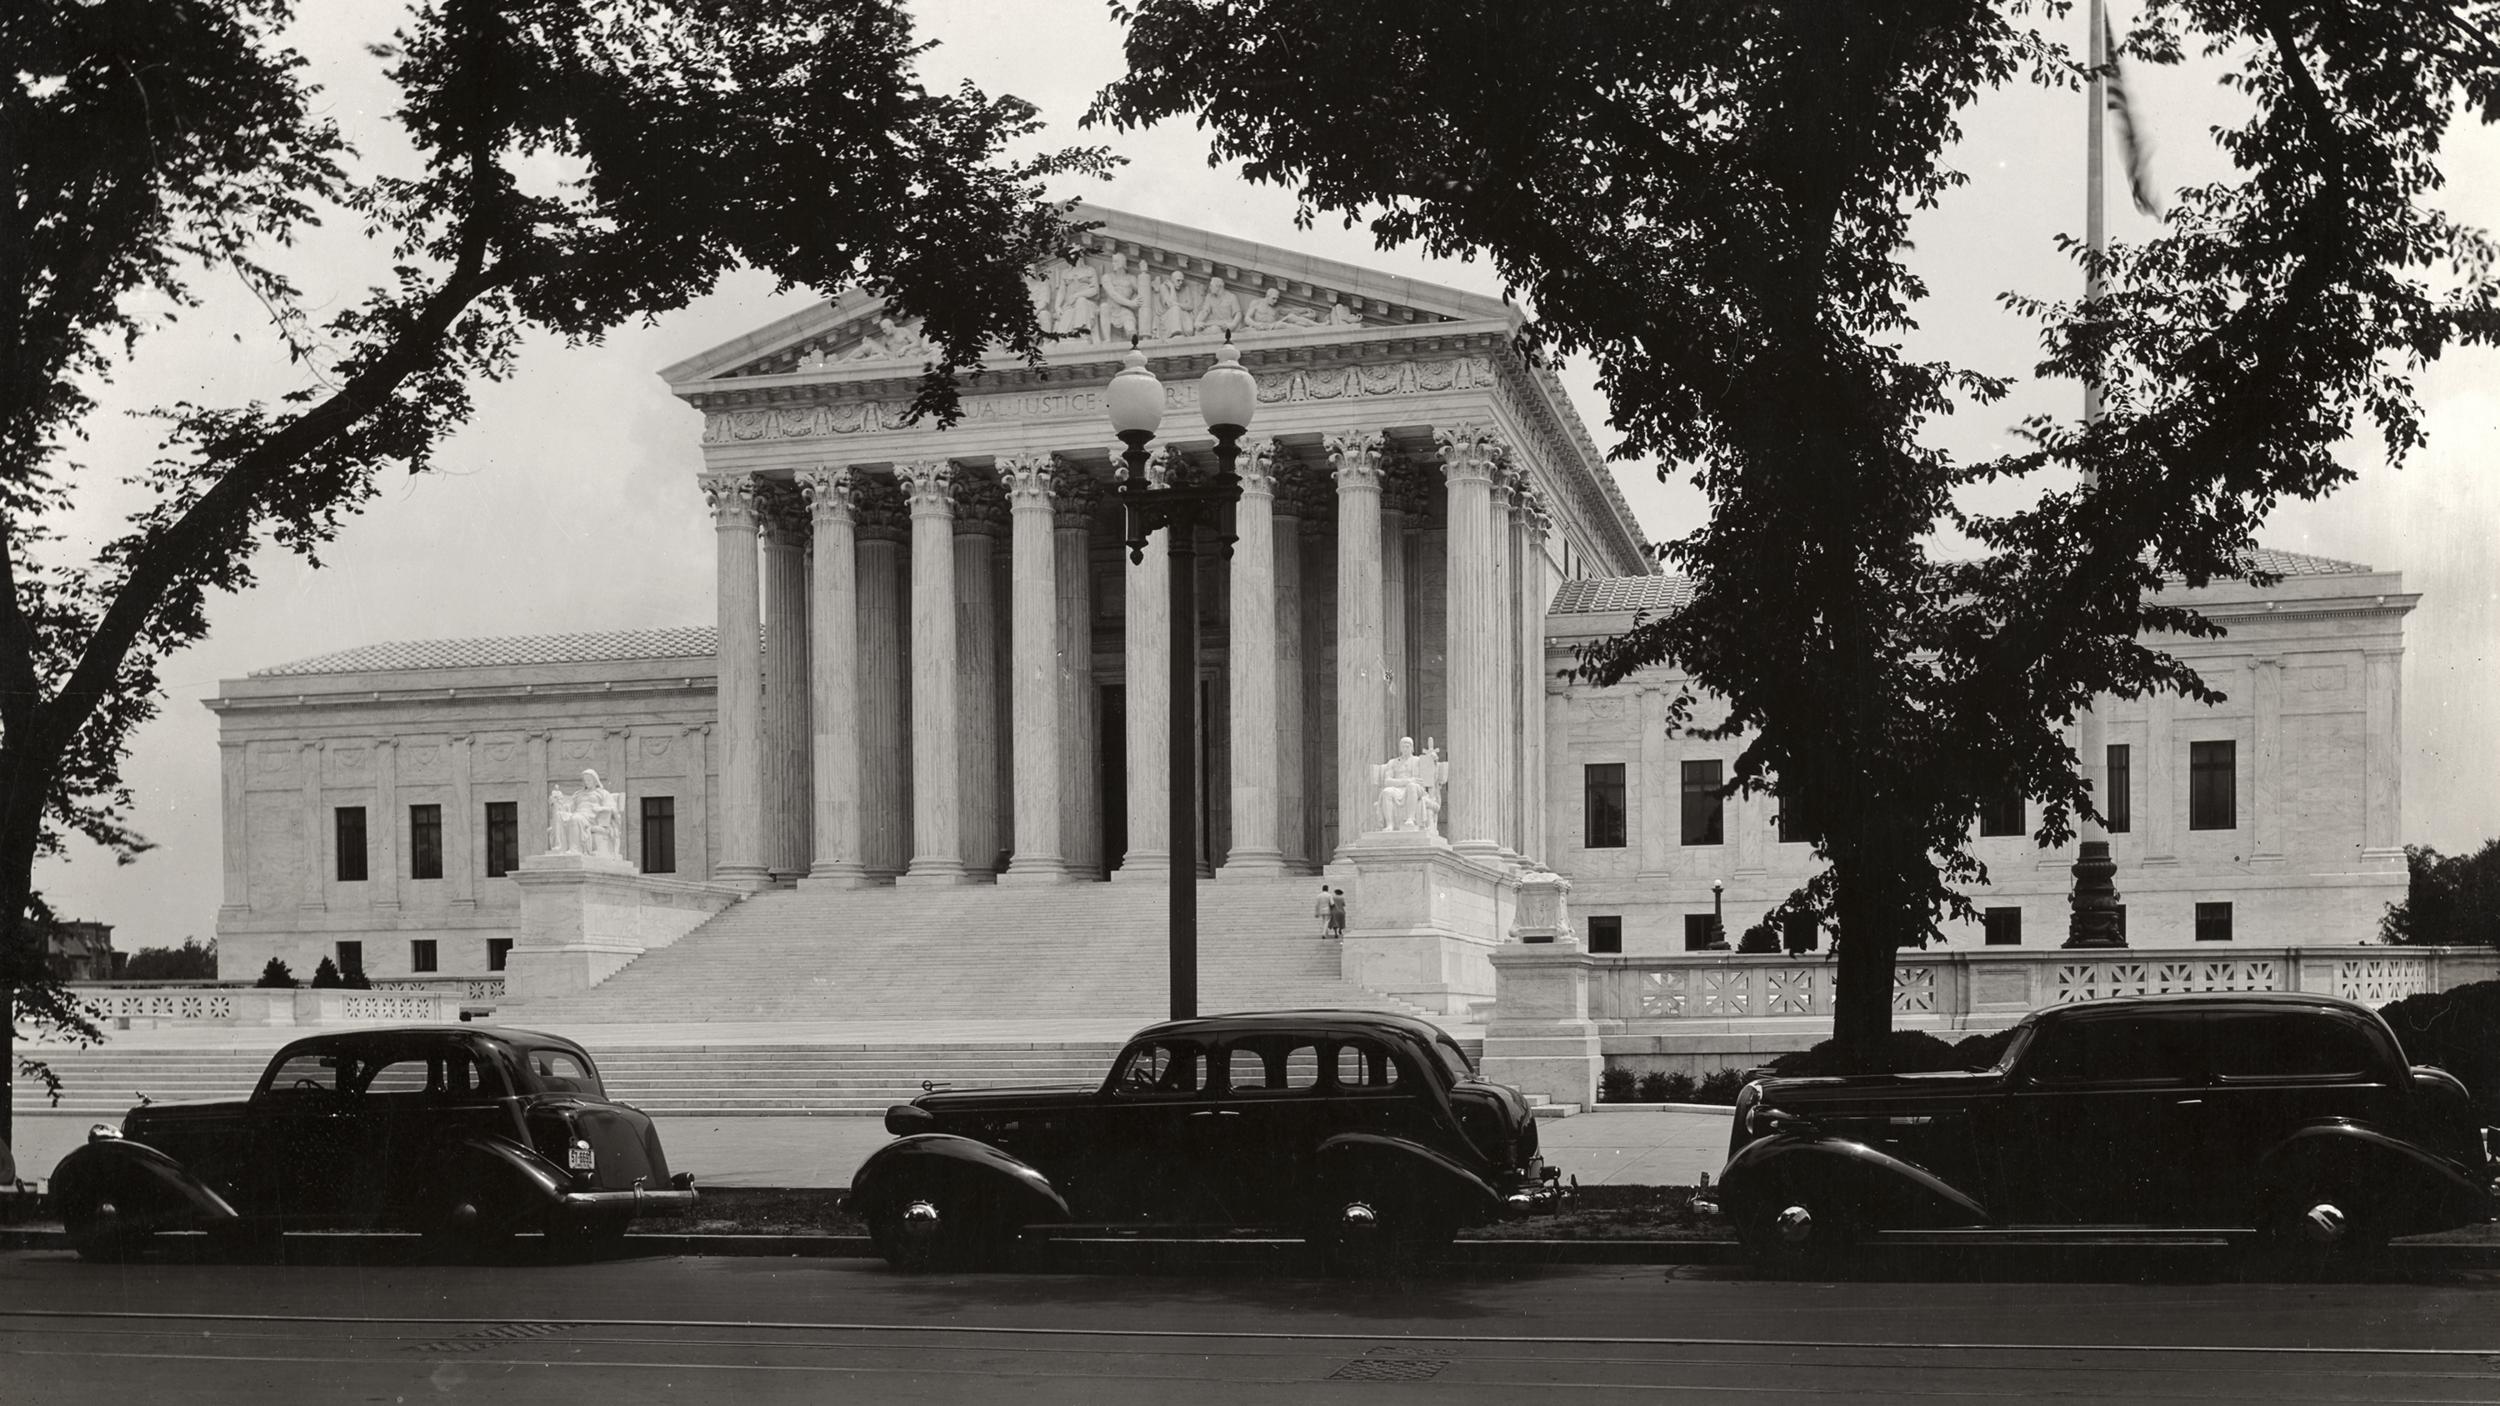 Checks and Balances, Jefferson, Checks and Balances - The Jefferson Watch